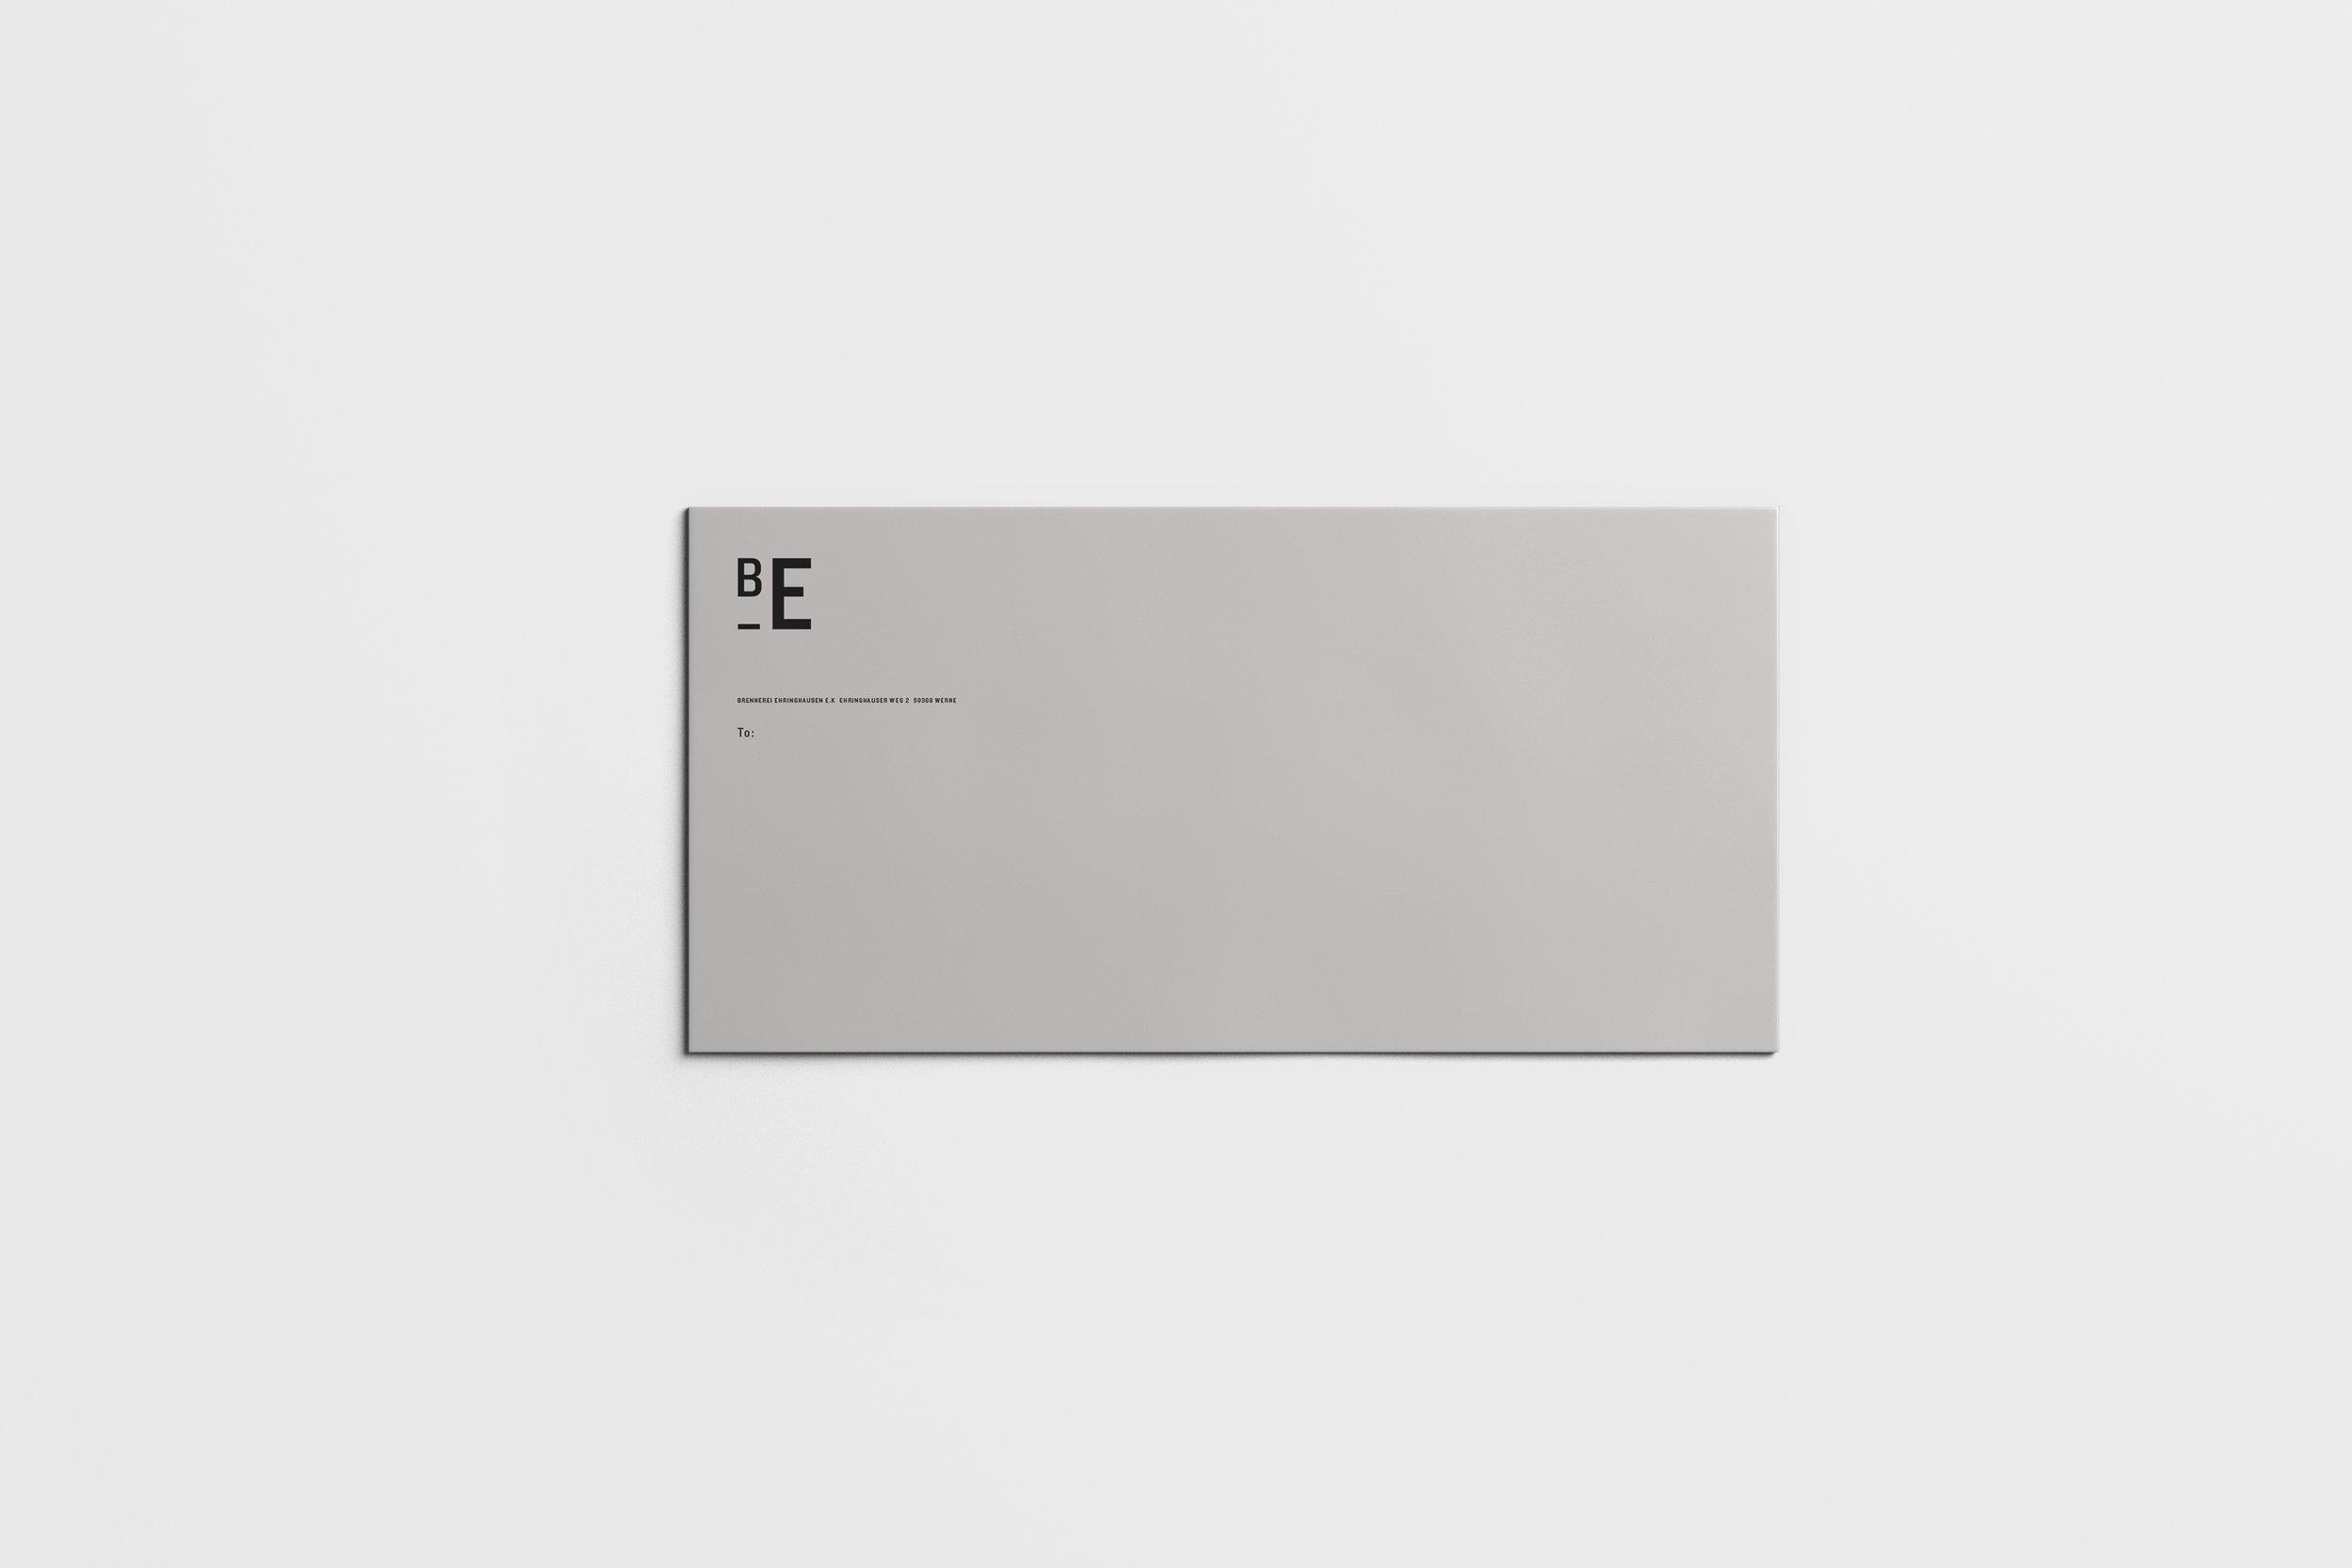 ffine_Brinkmann-Sonnenberg_Brennerei-Ehringhausen_corporate-design-10.jpg